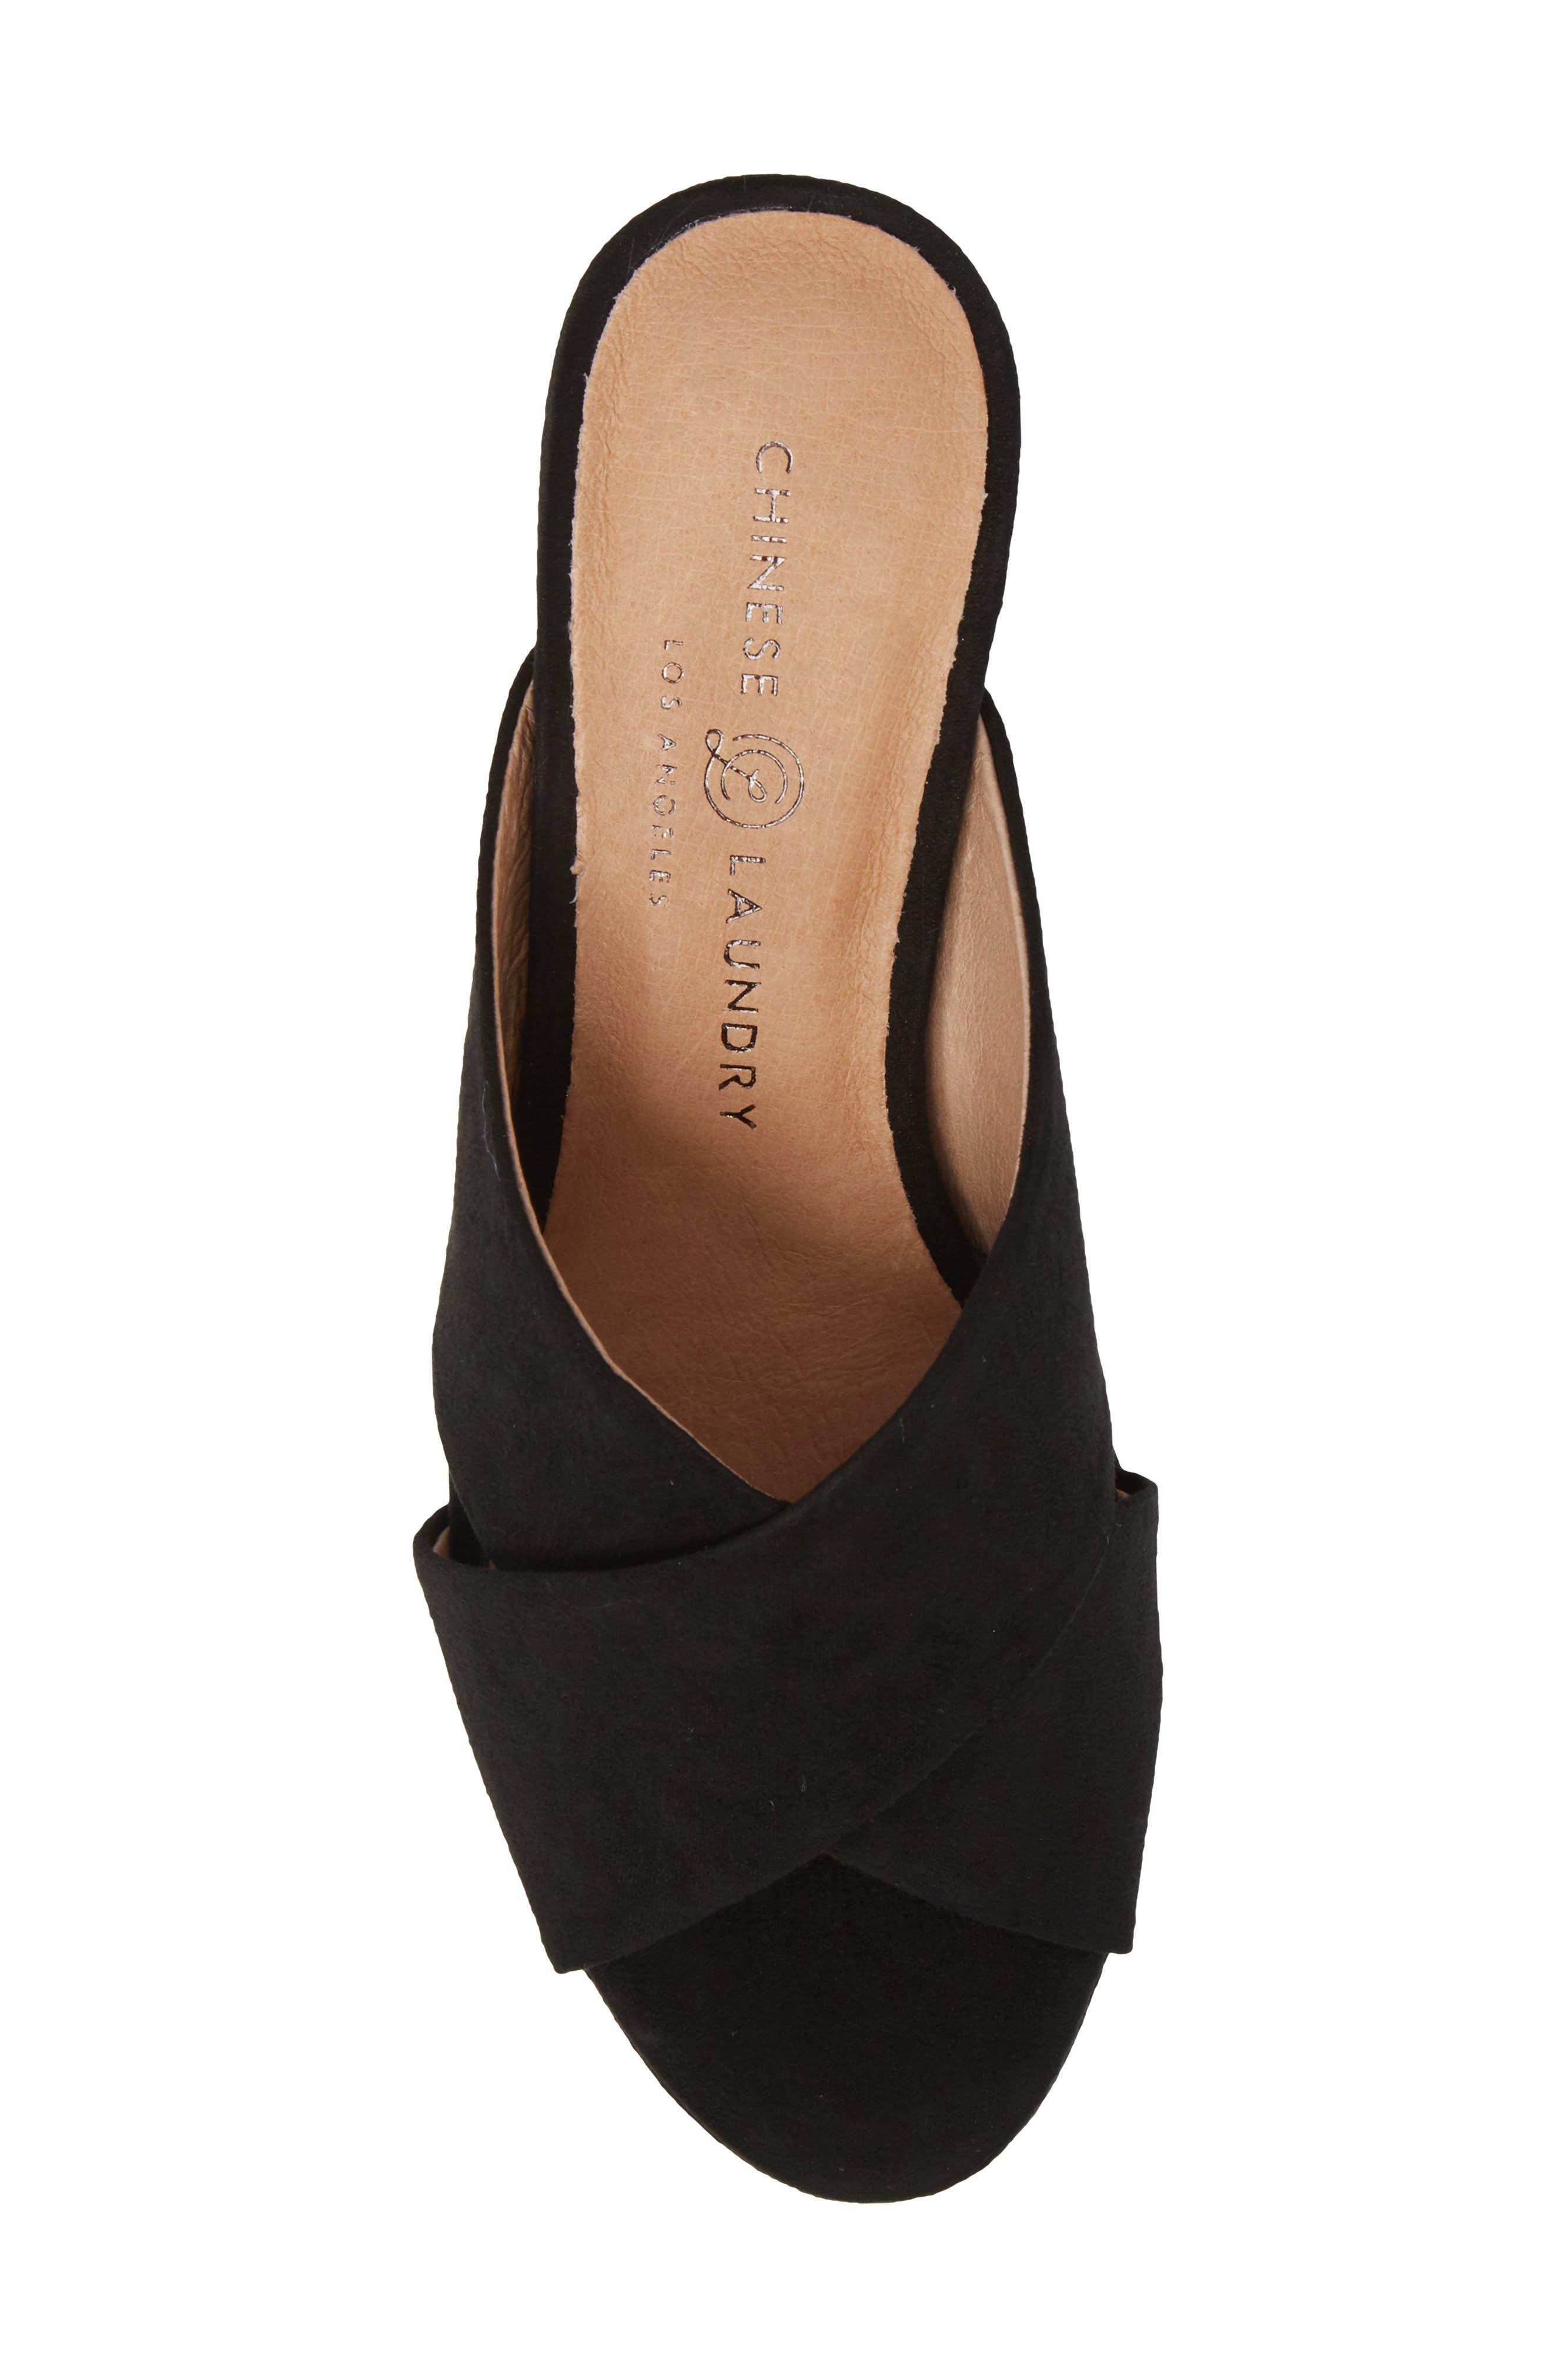 Teagan Cross Strap Platform Sandal,                             Alternate thumbnail 5, color,                             BLACK